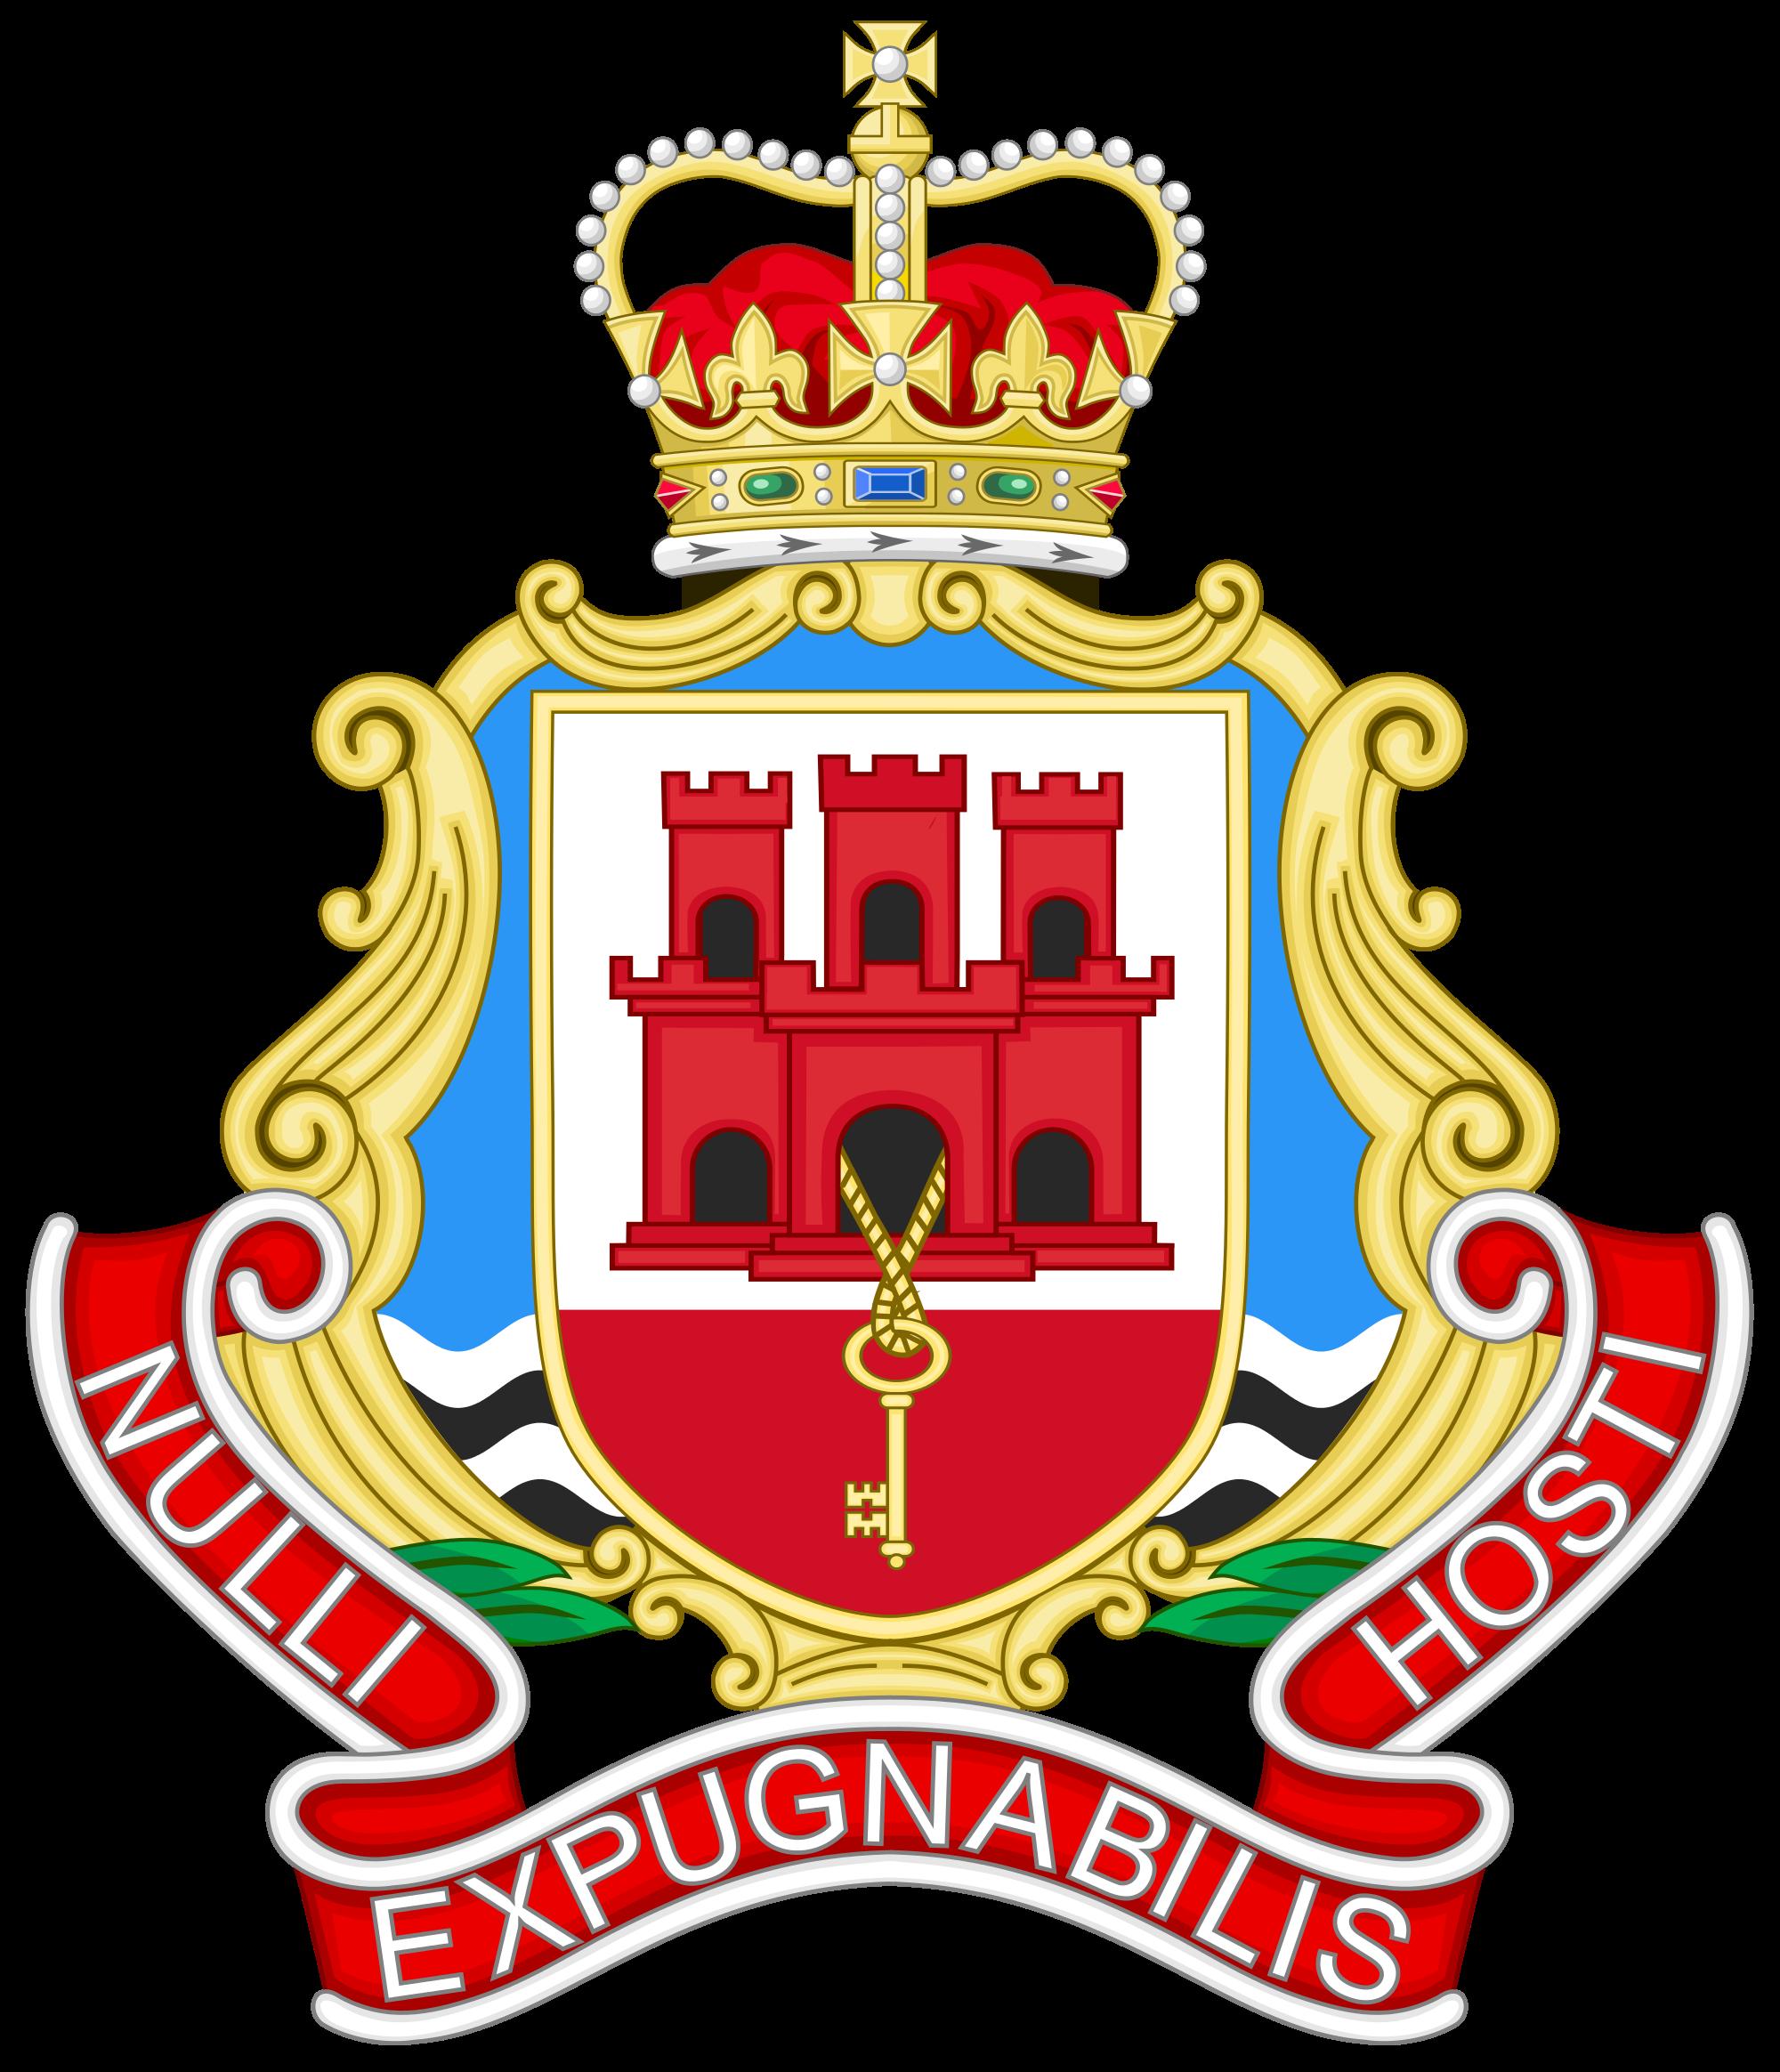 Soldiers clipart serviceman. Royal gibraltar regiment soldier